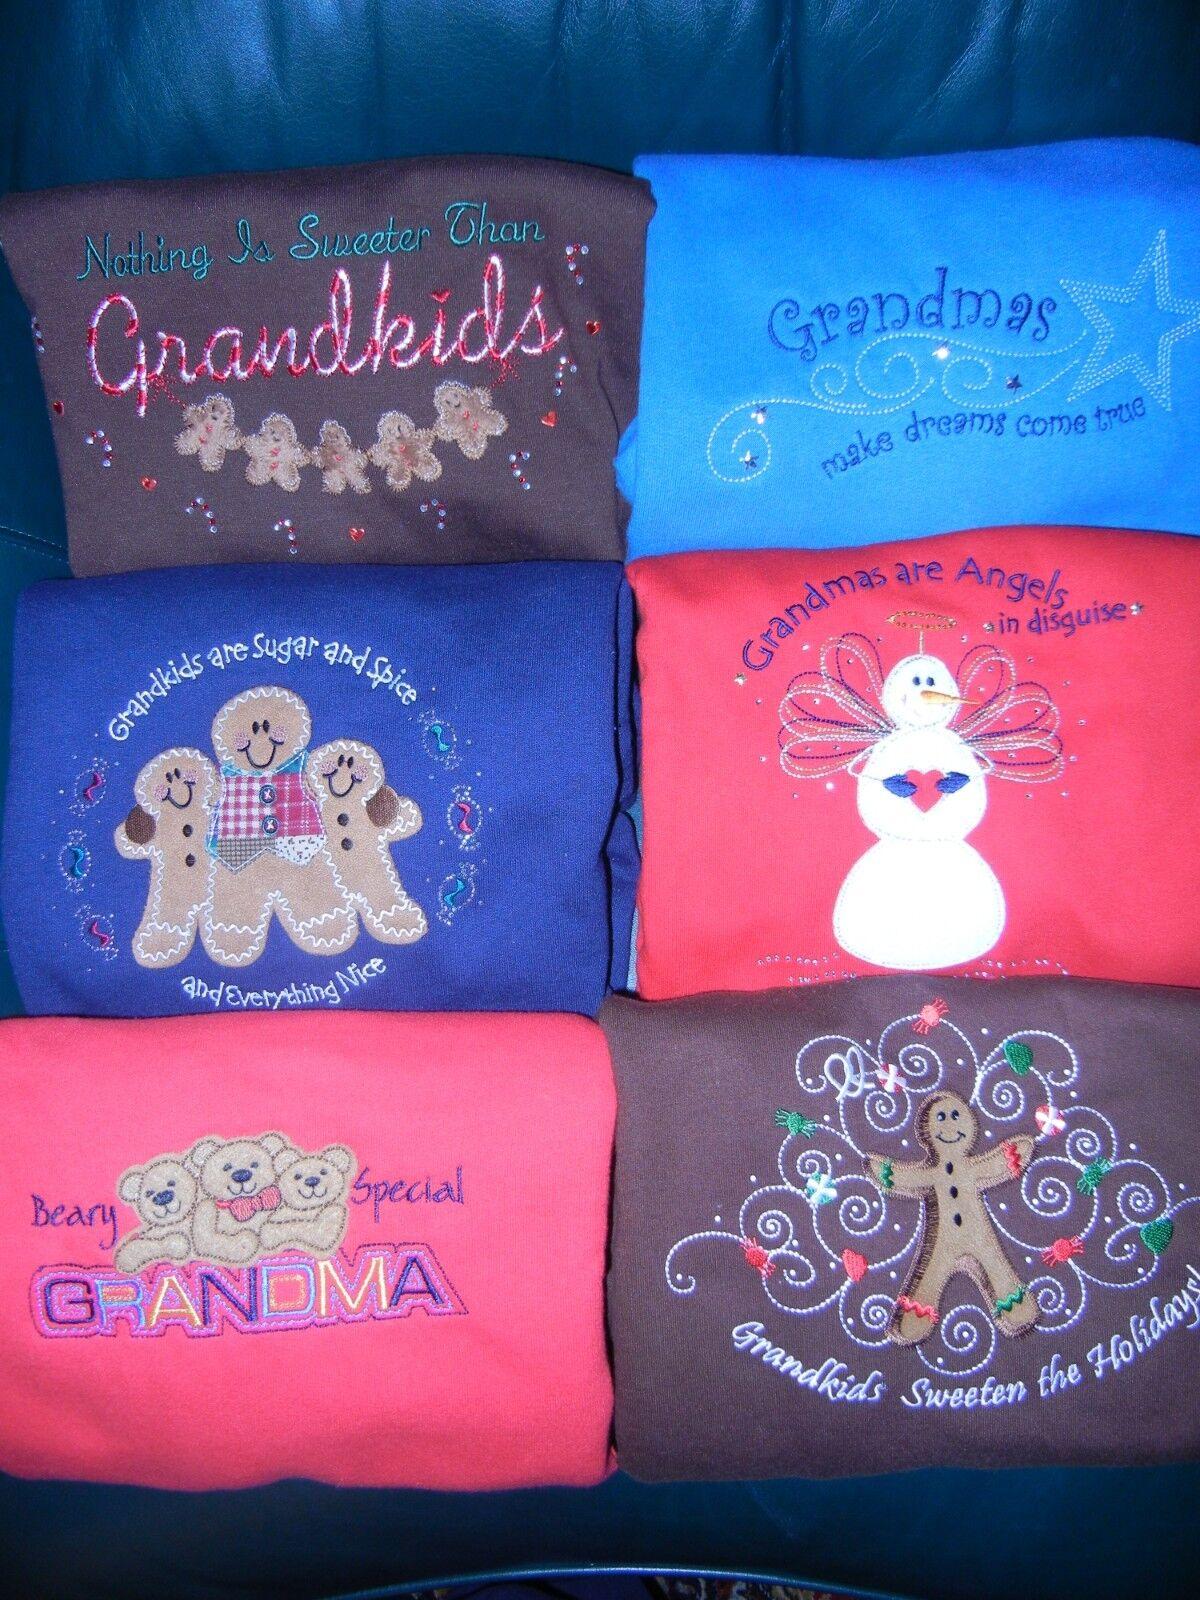 Set of 6 Grandma Grandkids Embroidered Sweatshirts - EXCELLENT